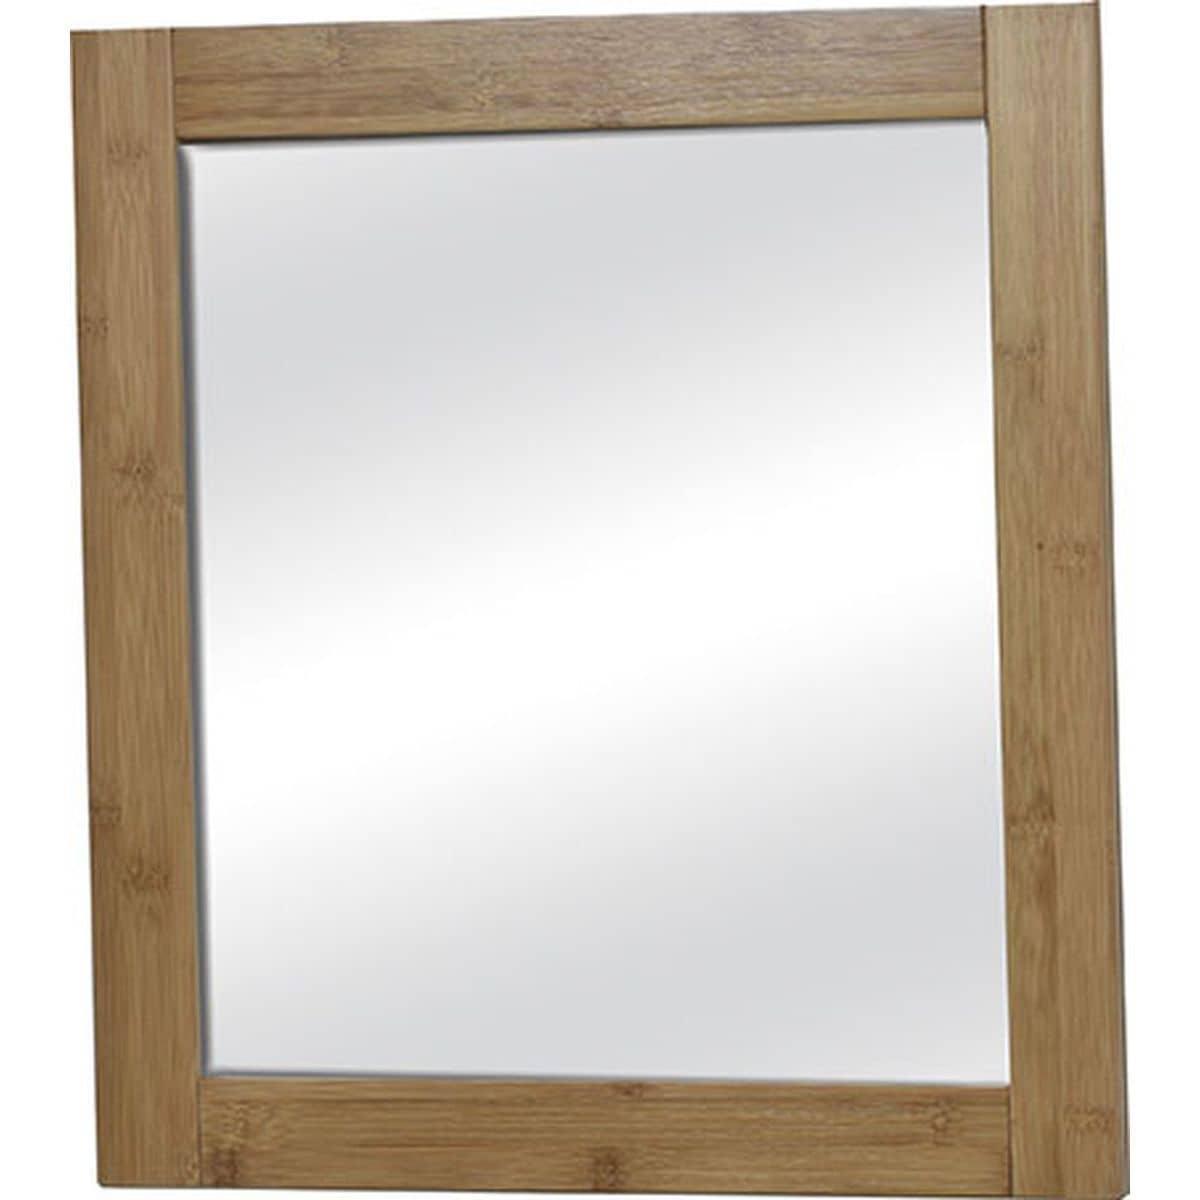 4goodz Bamboe Badkamer Spiegel Vierkant Mahe 48x1,5x51,8 cm - bruin